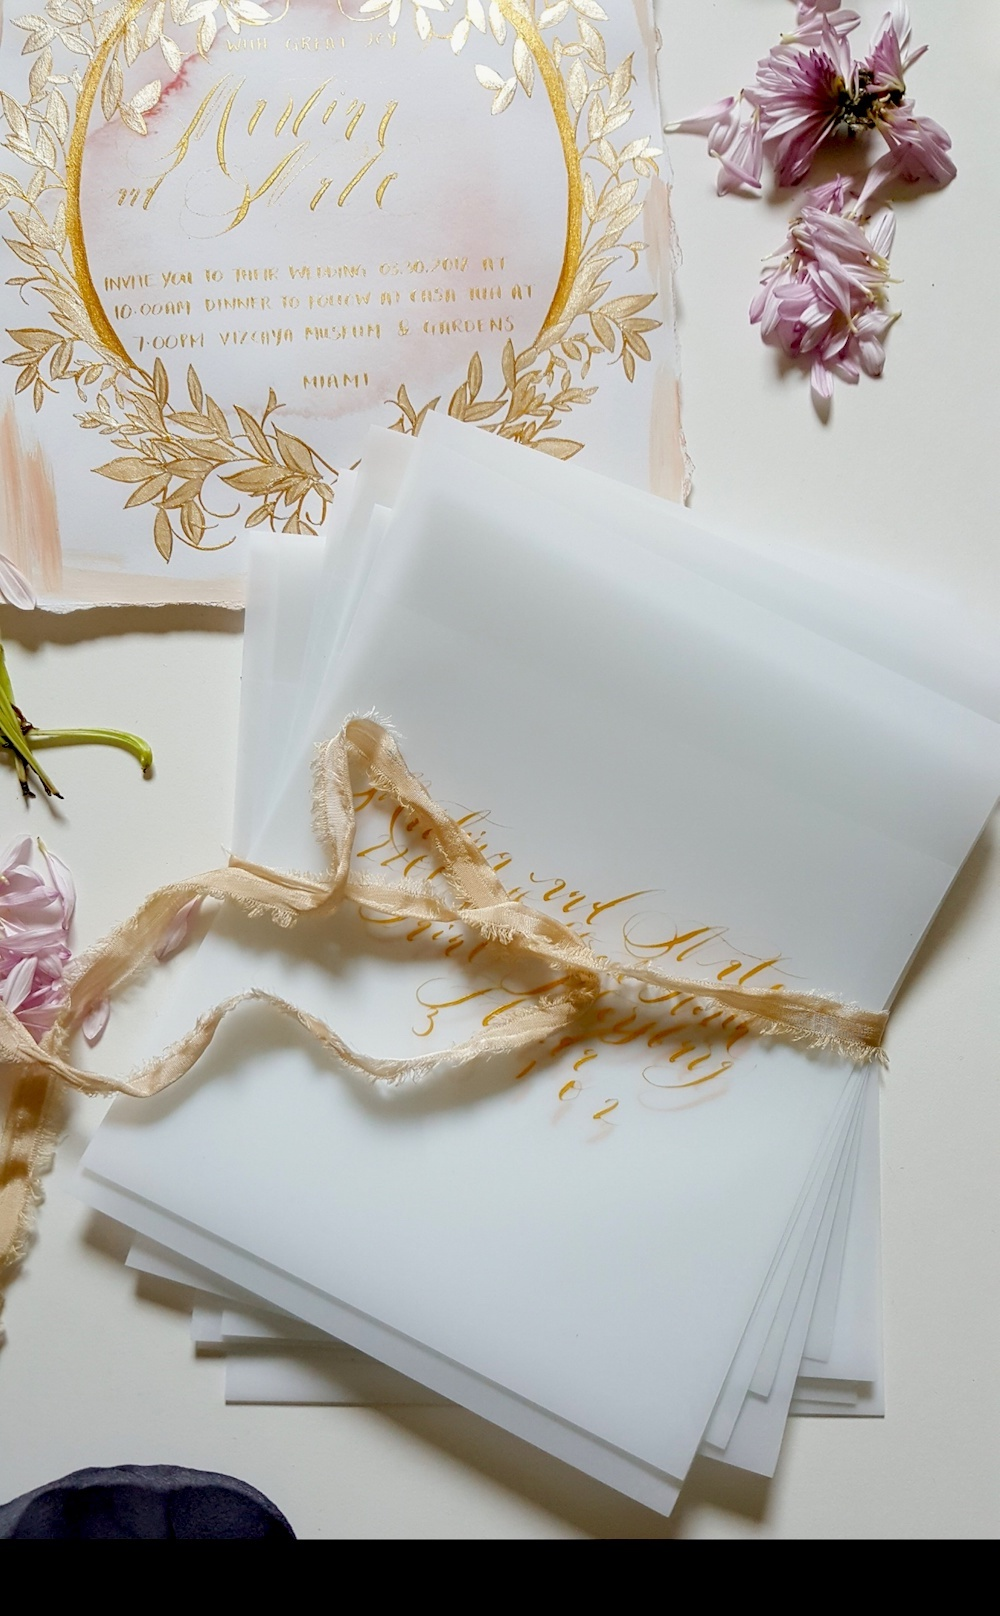 Handwritten Calligraphy Wedding Invitations large vellum envelopes ...